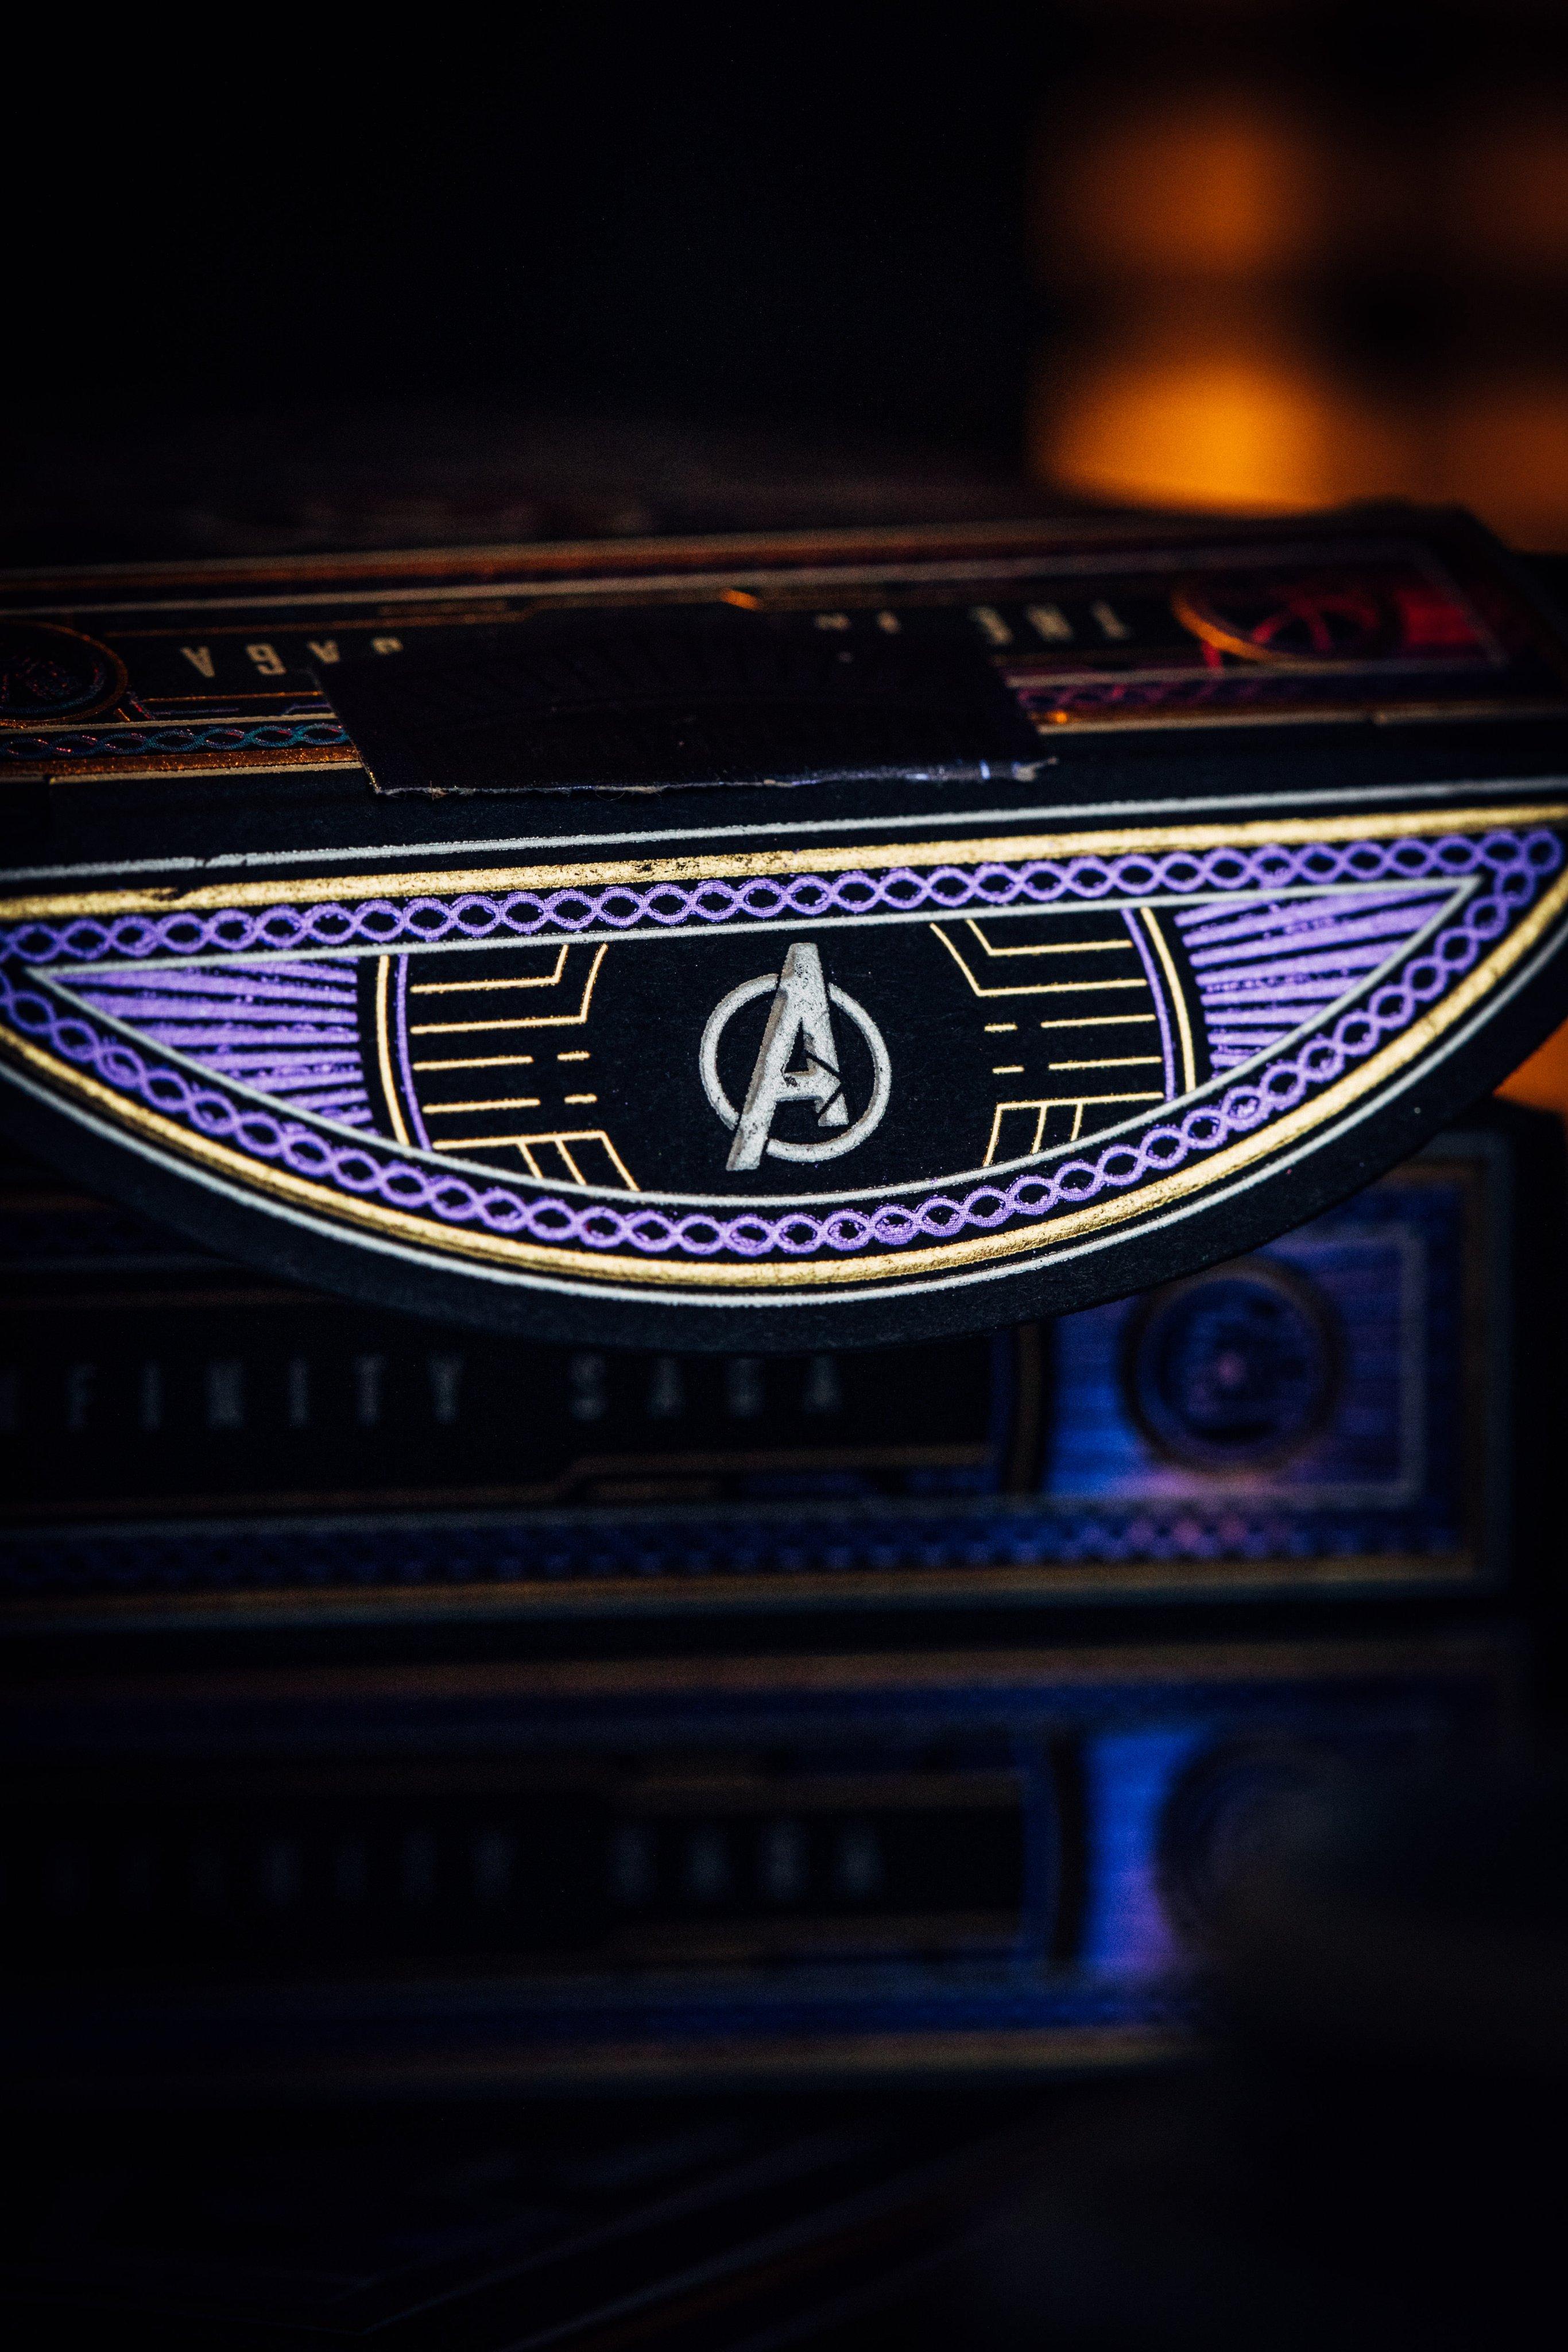 Avengers6_4472x4472-min